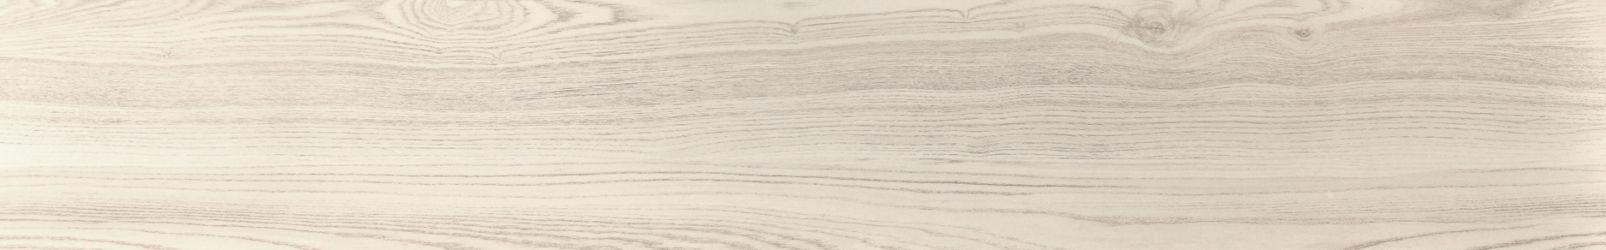 Ламинат Imperial Ibiza 825 Каштан Белый 1215x196x8мм доска